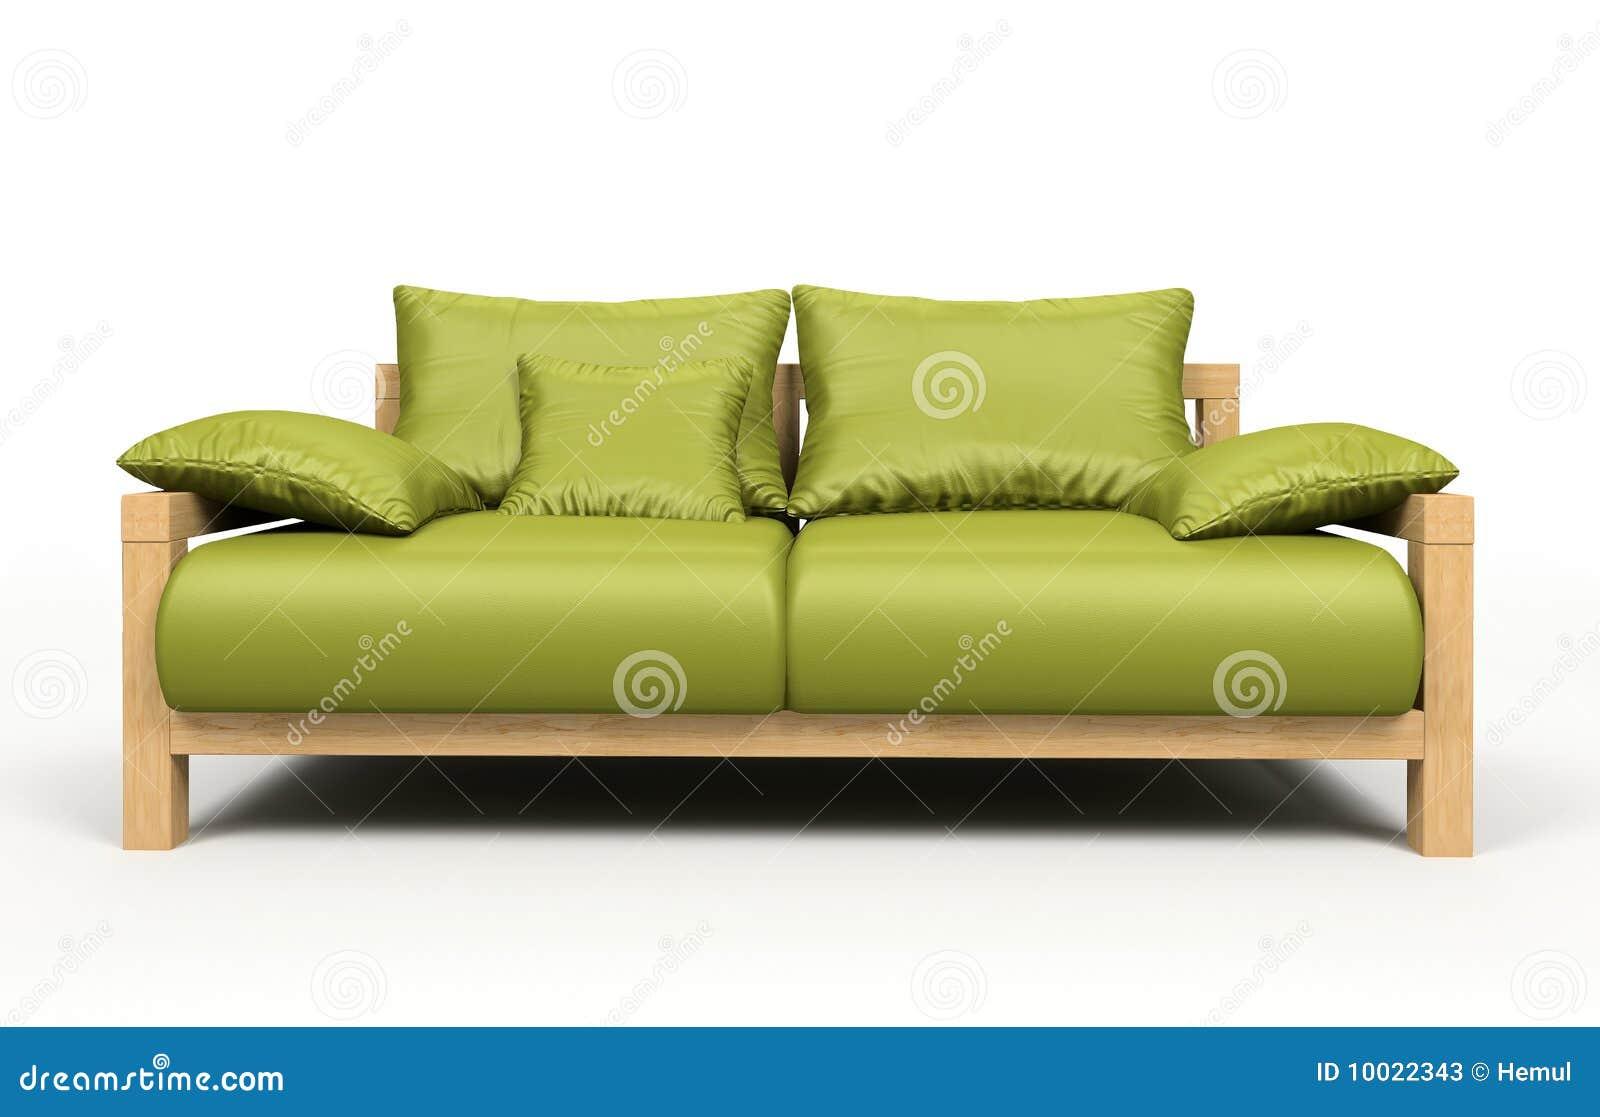 Modern Green Sofa modern green sofa stock photos - image: 10022343